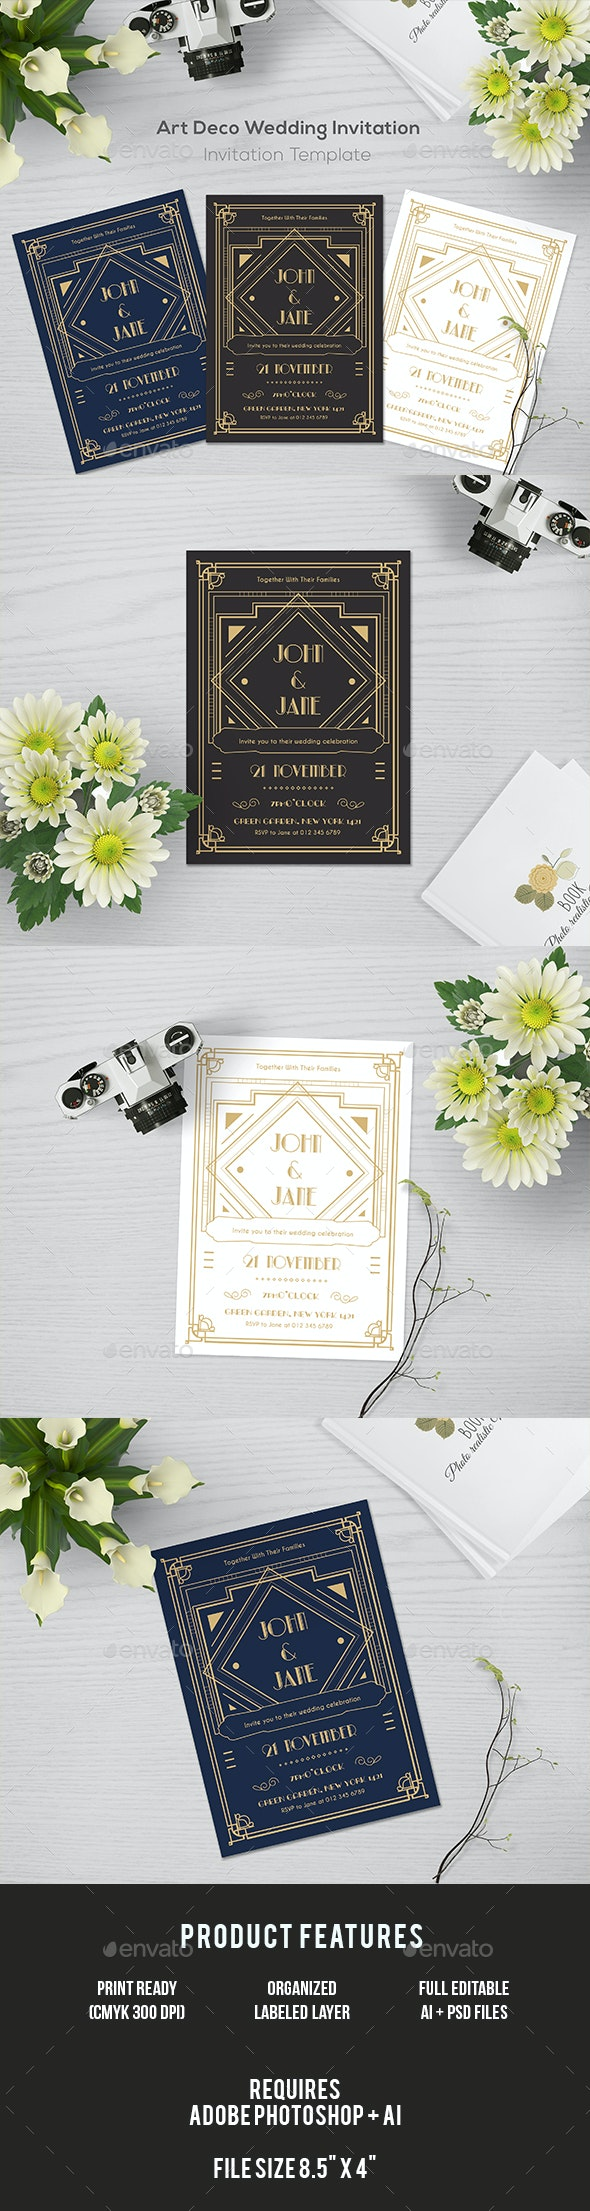 Art Deco Wedding Invitation - Invitations Cards & Invites